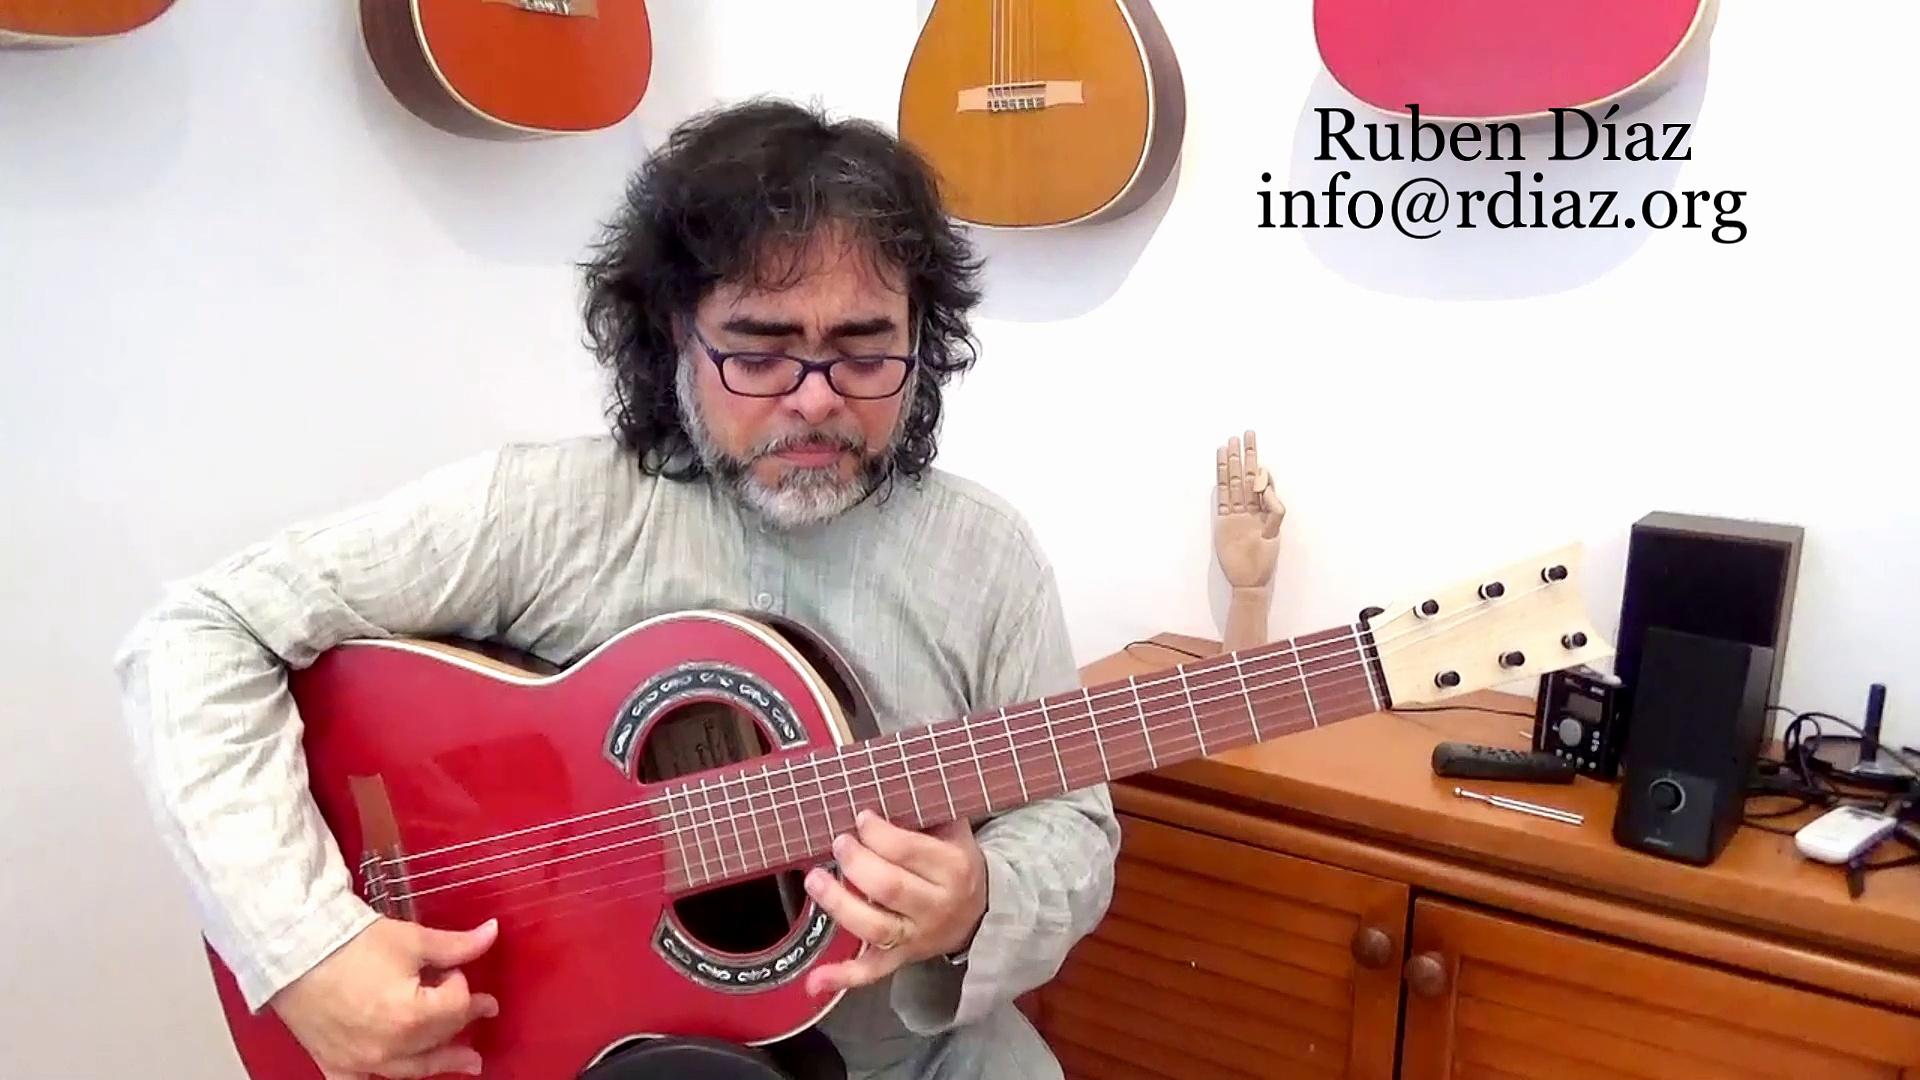 Dogal Maestrale bass set  (The superb Italian strings) Ruben Diaz tips on modern flamenco guitar CFG Spain